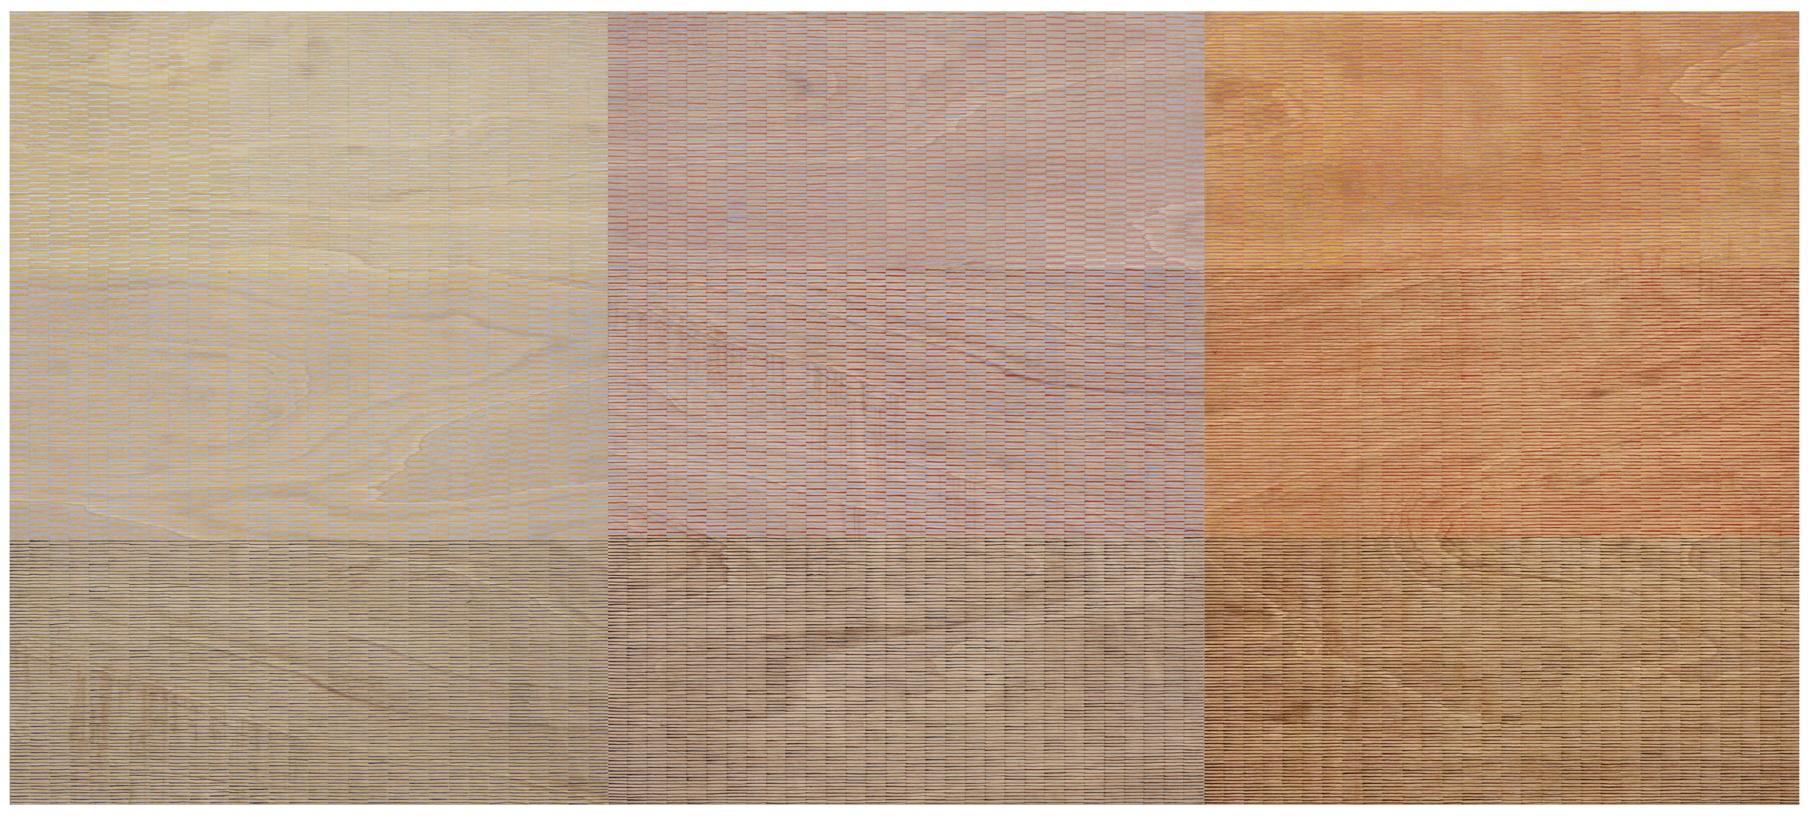 Eveline Kotai - Breathing Pattern #2, 2010, 120x270, acrylic on ply, available Art Collective WA